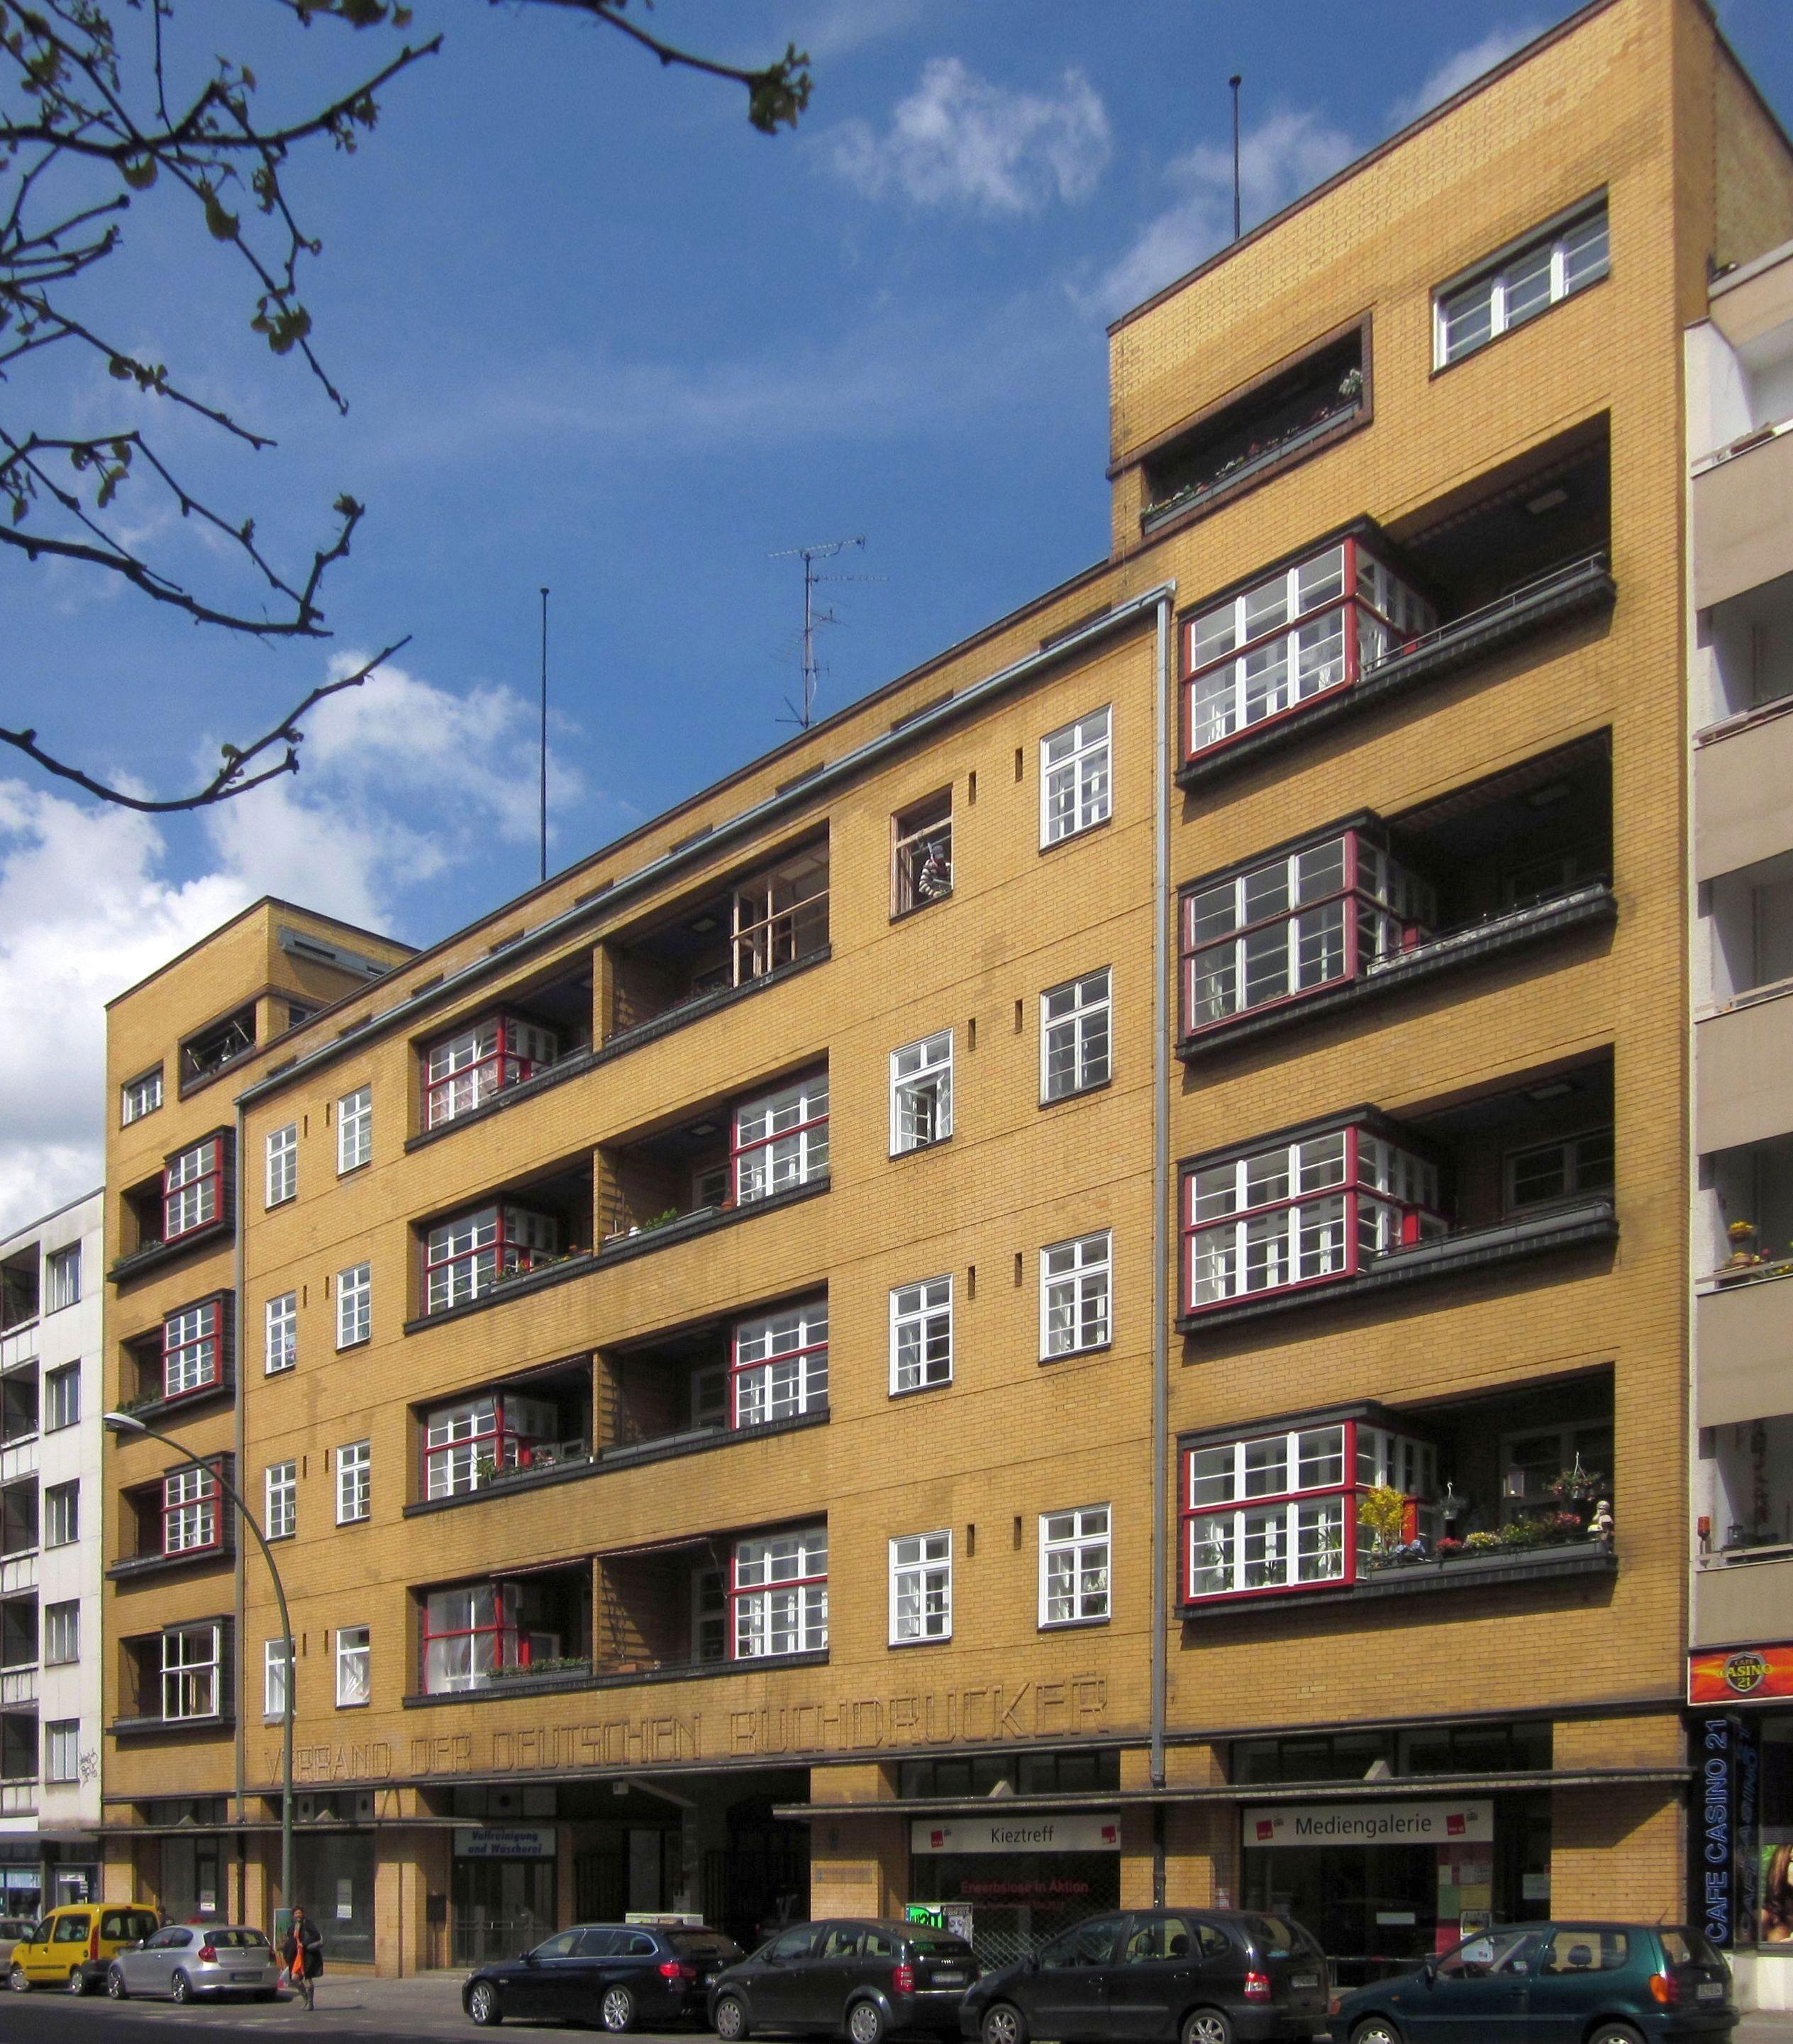 File:Berlin, Kreuzberg, Dudenstrasse 10, Verbandshaus der ... size: 2528 x 2882 post ID: 9 File size: 0 B